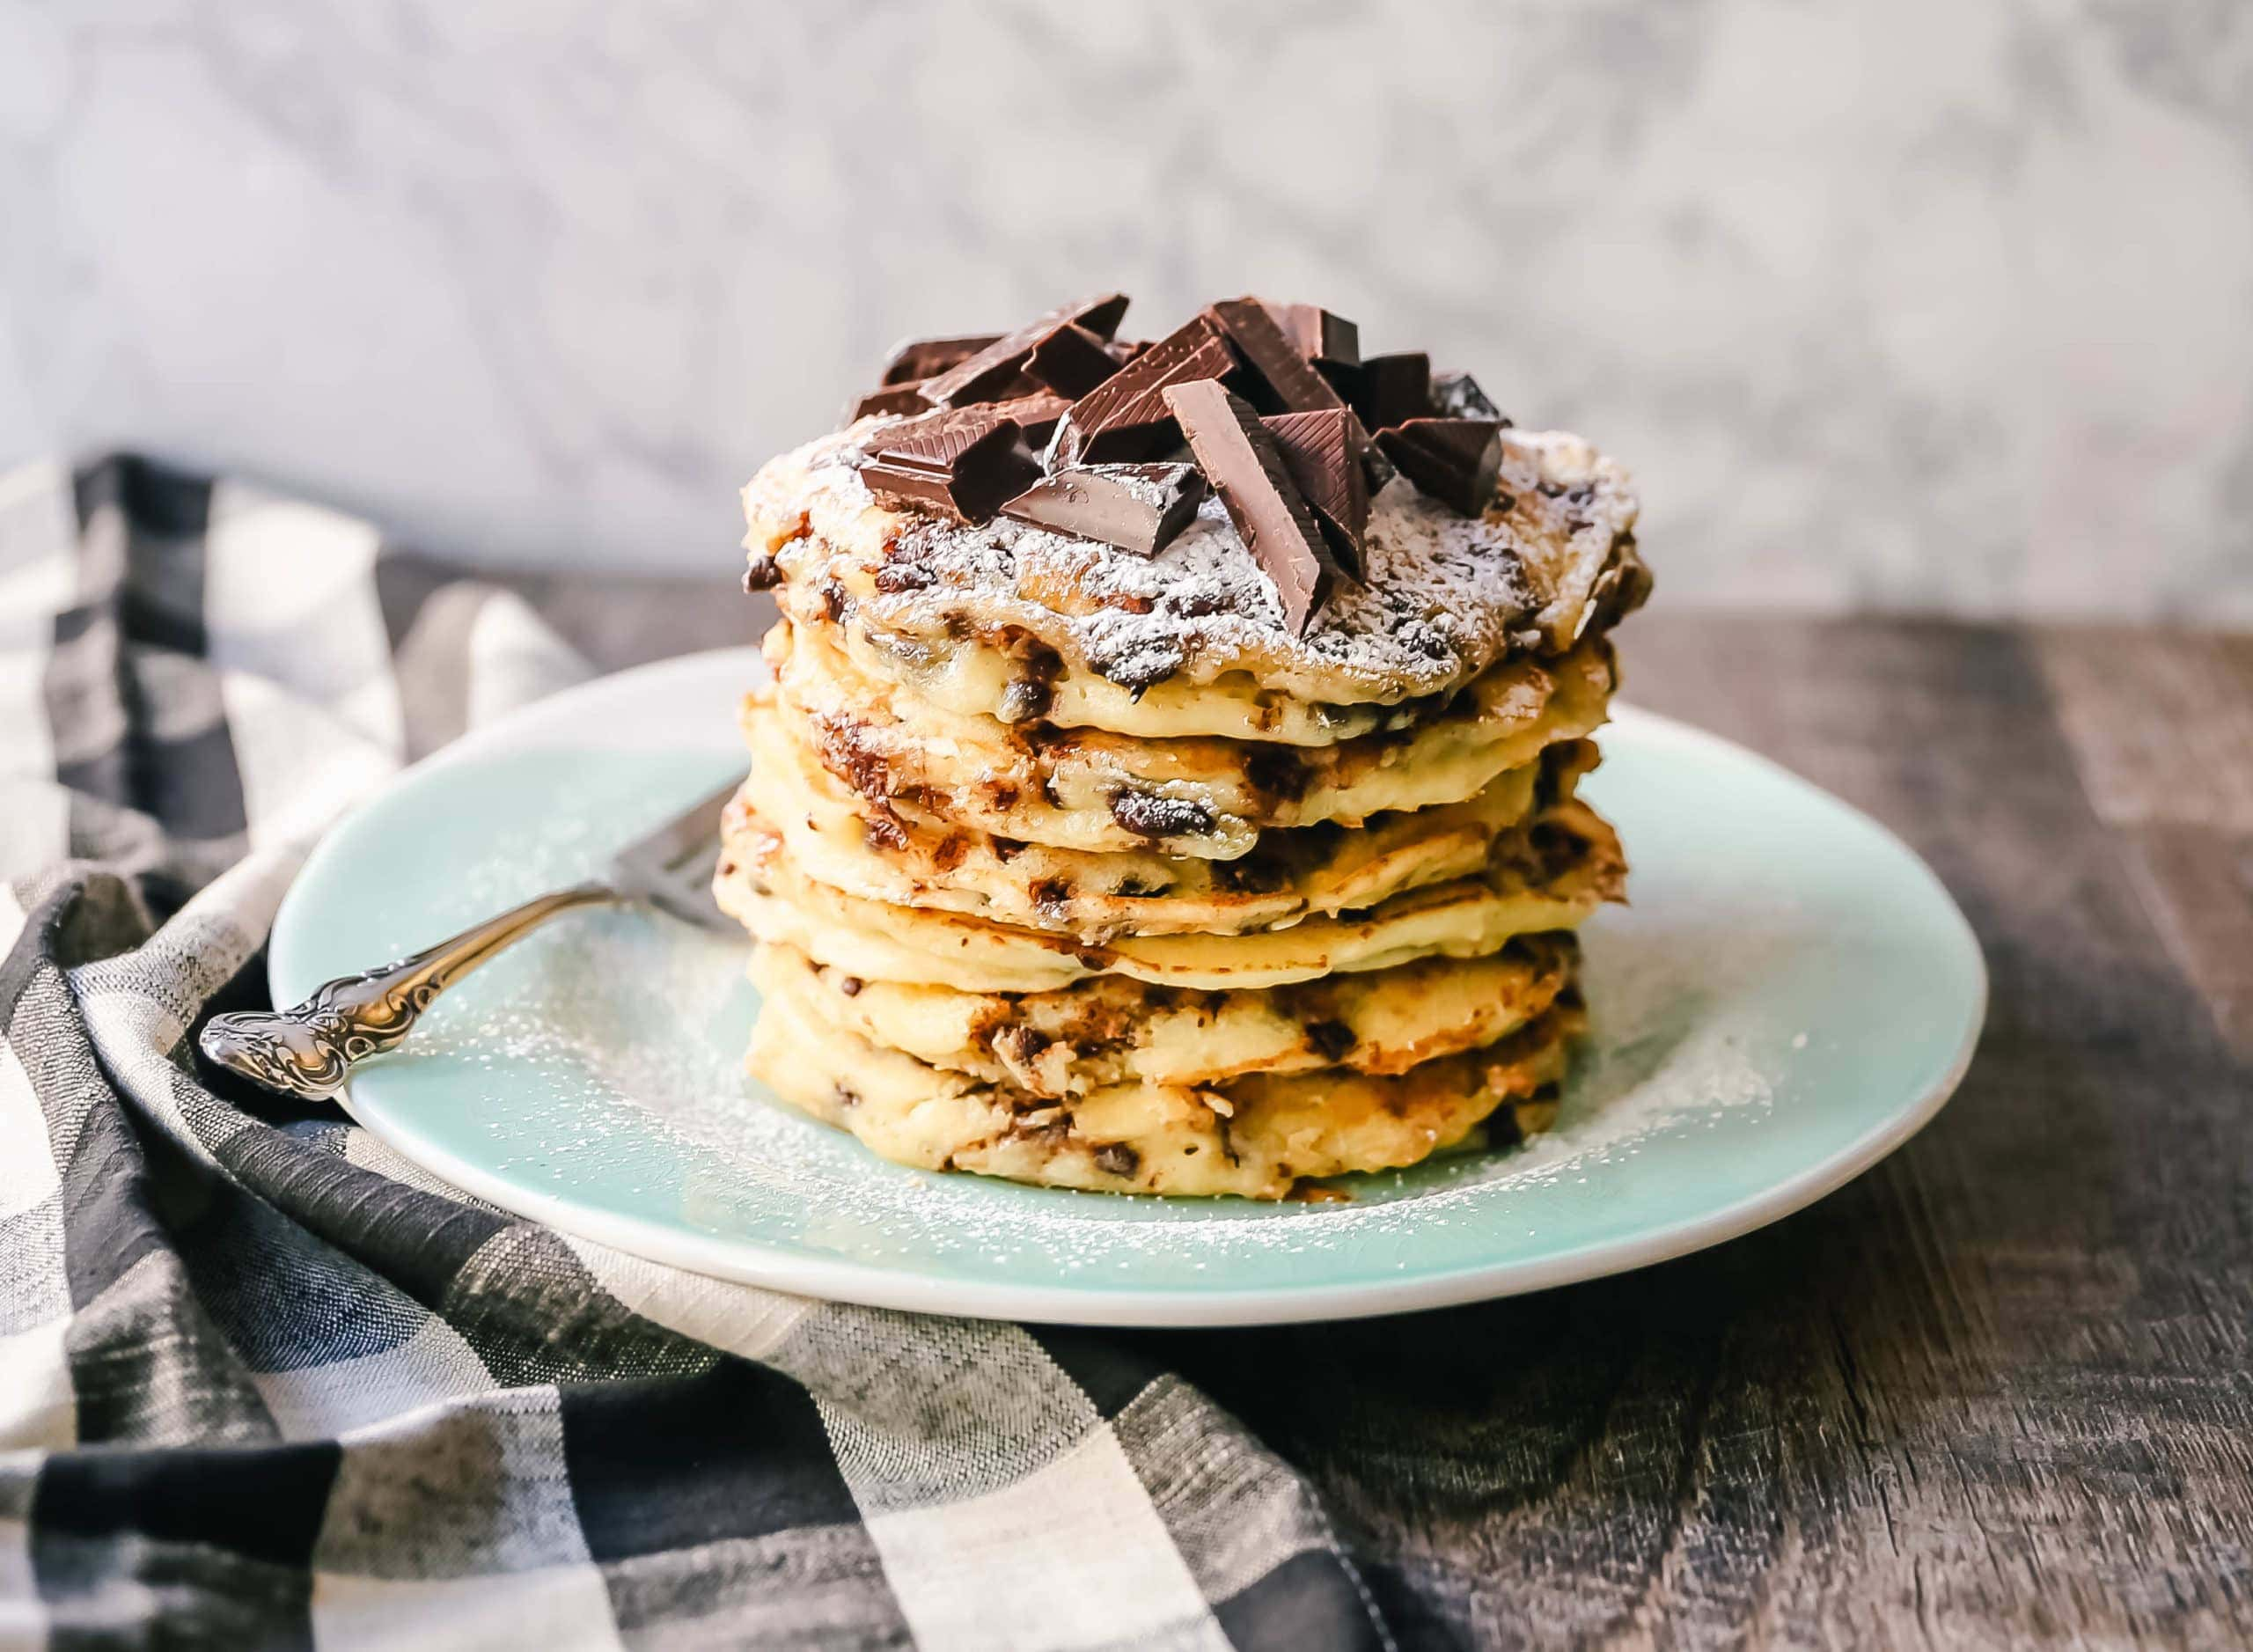 Chocolate Chip Ricotta Pancakes Creamy homemade one-bowl ricotta pancakes with chocolate chips. How to make easy 5-minute chocolate chip ricotta pancakes from scratch! www.modernhoney.com #ricottapancakes #pancakes #chocolatechipricottapancakes